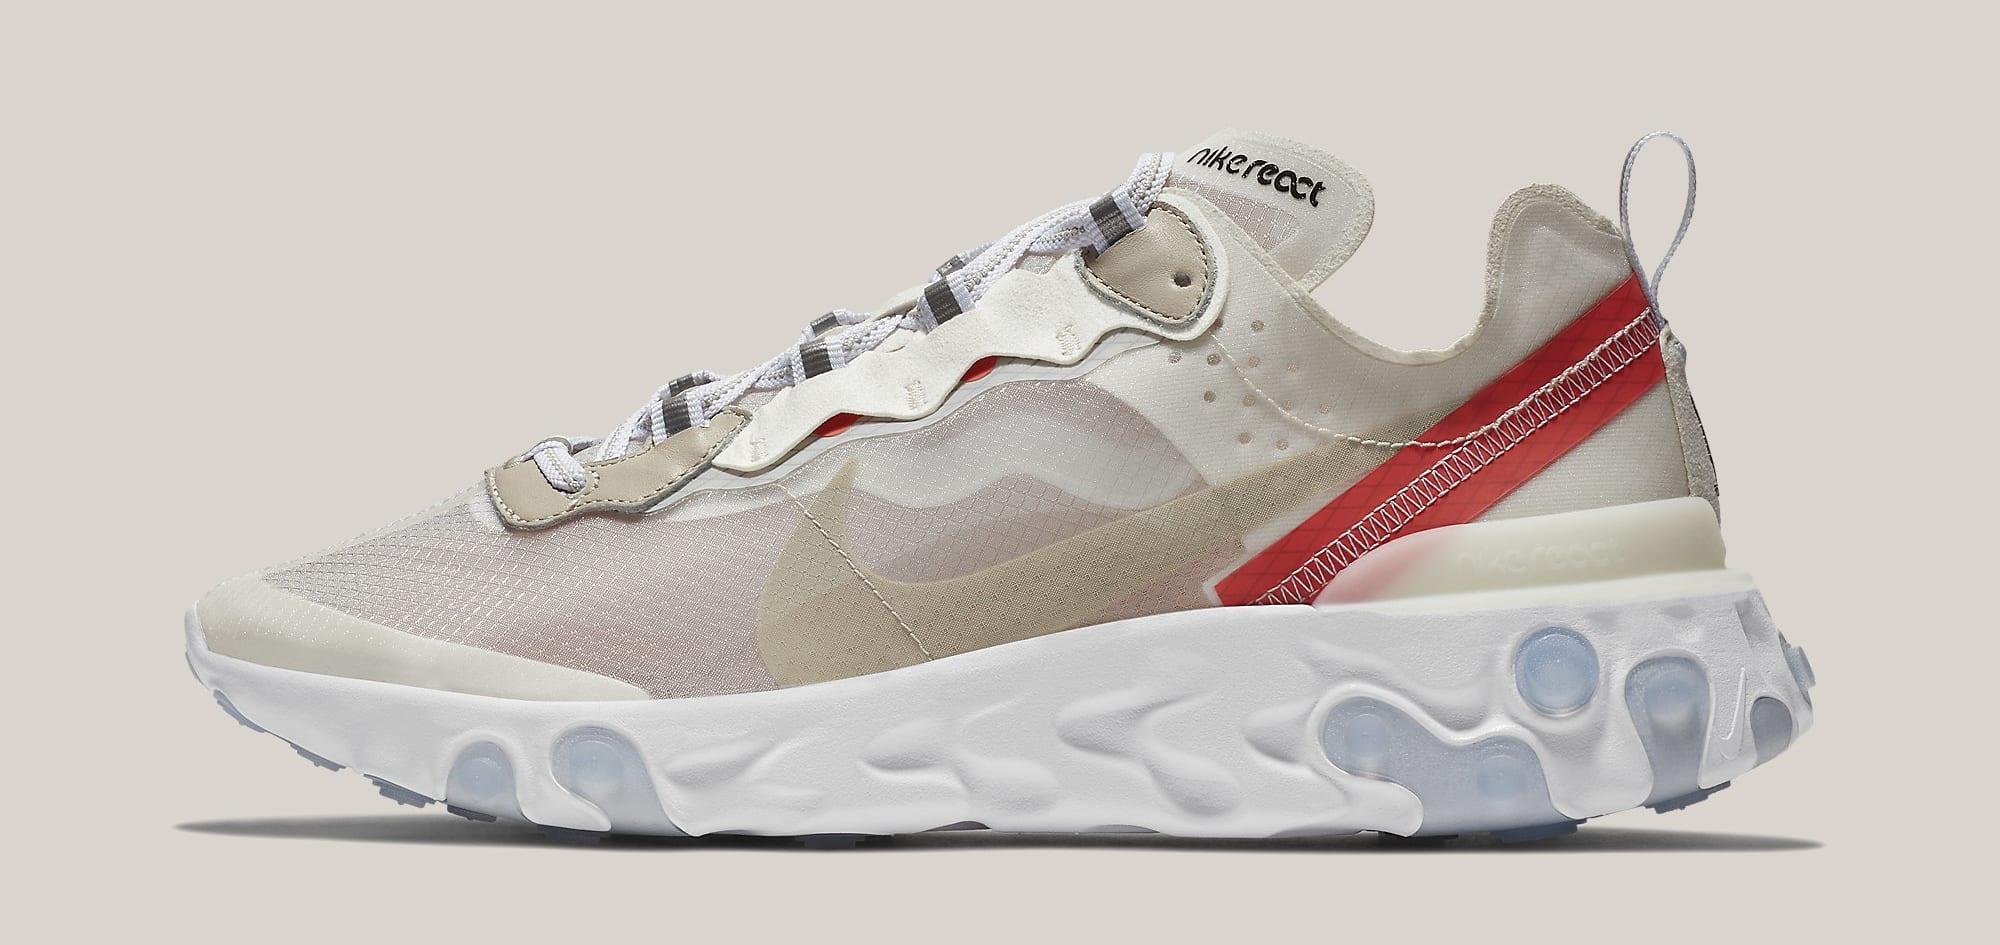 Nike React Element 87 'Sail/Light Bone/White/Rush Orange/Black' AQ1090-100 (Lateral)